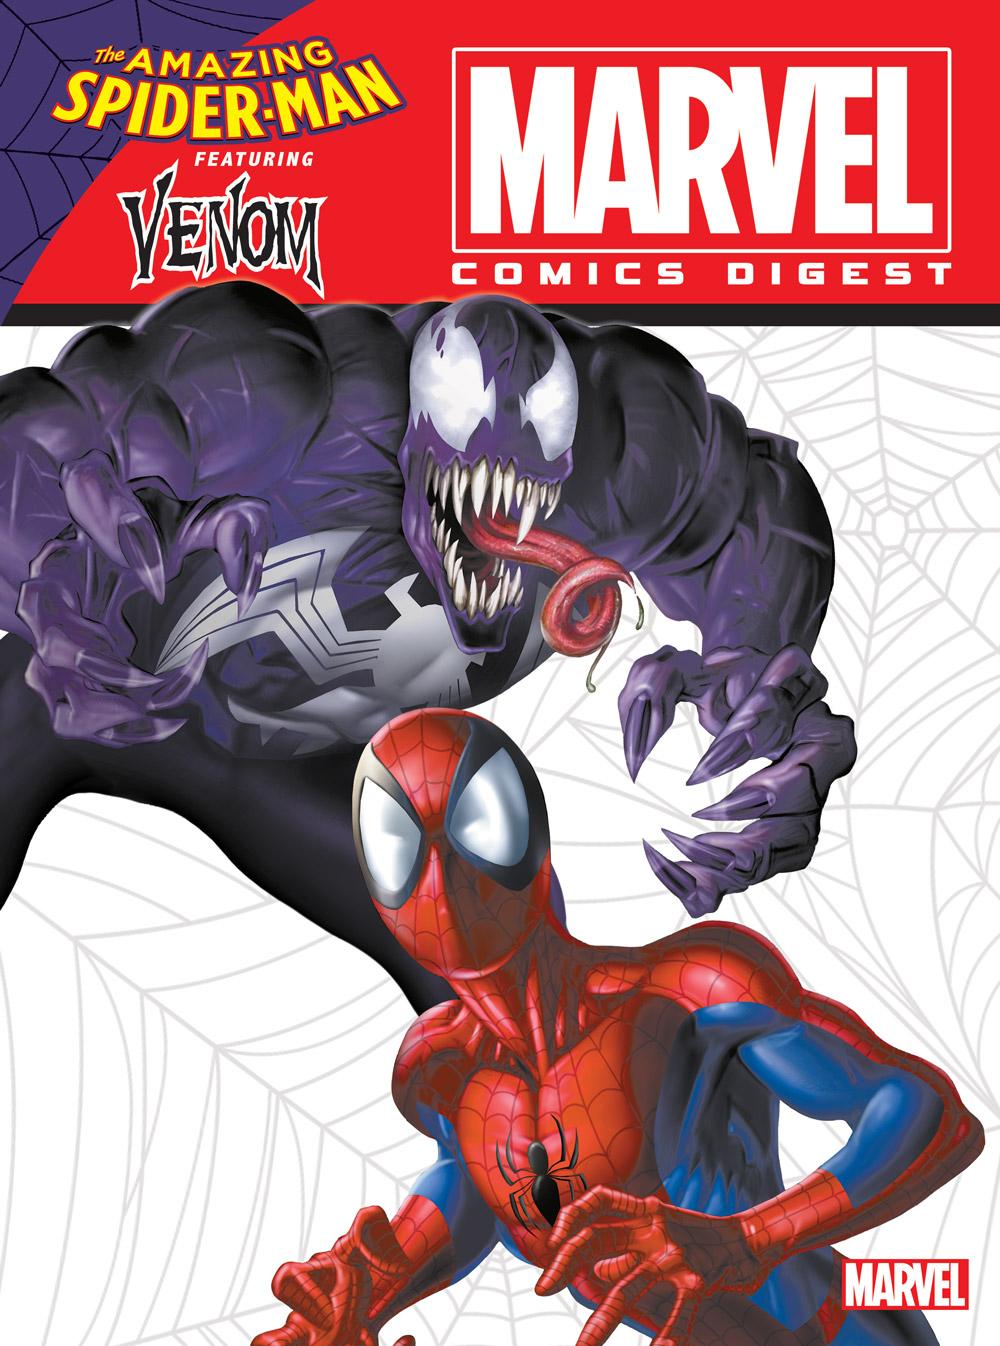 marvel comics digest #8 spider-man & venom - archie comics